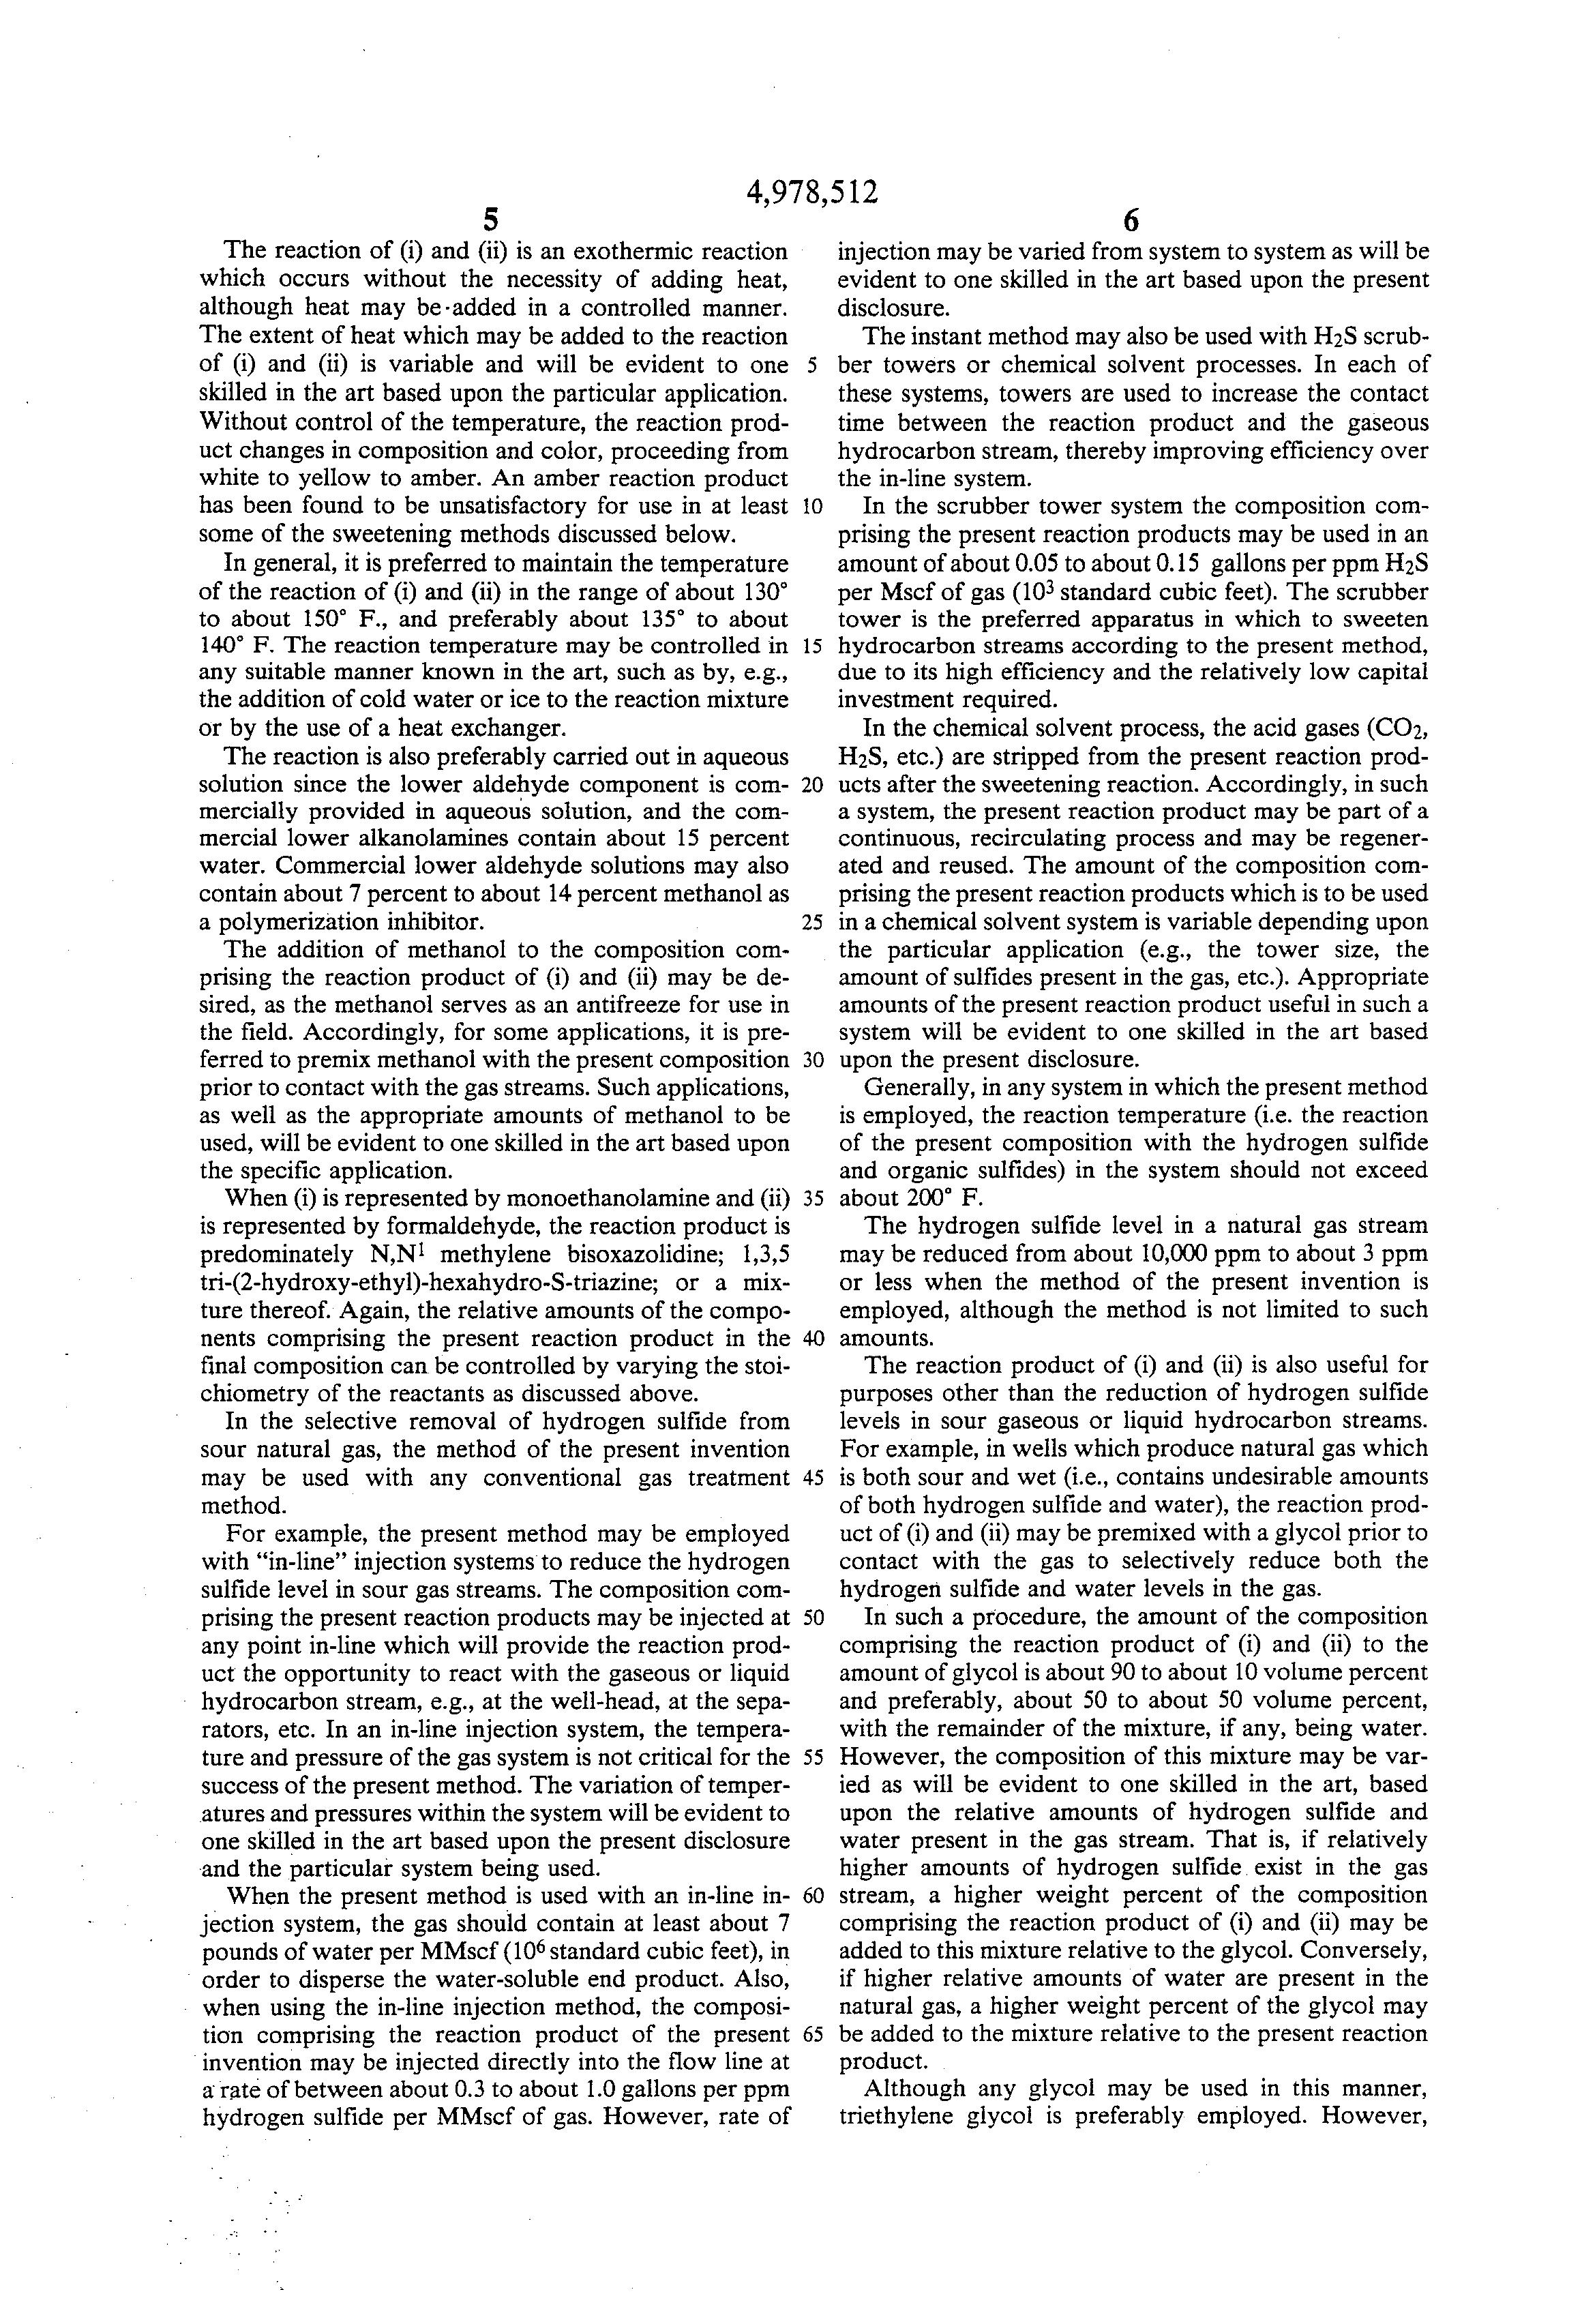 Law school personal essay examle